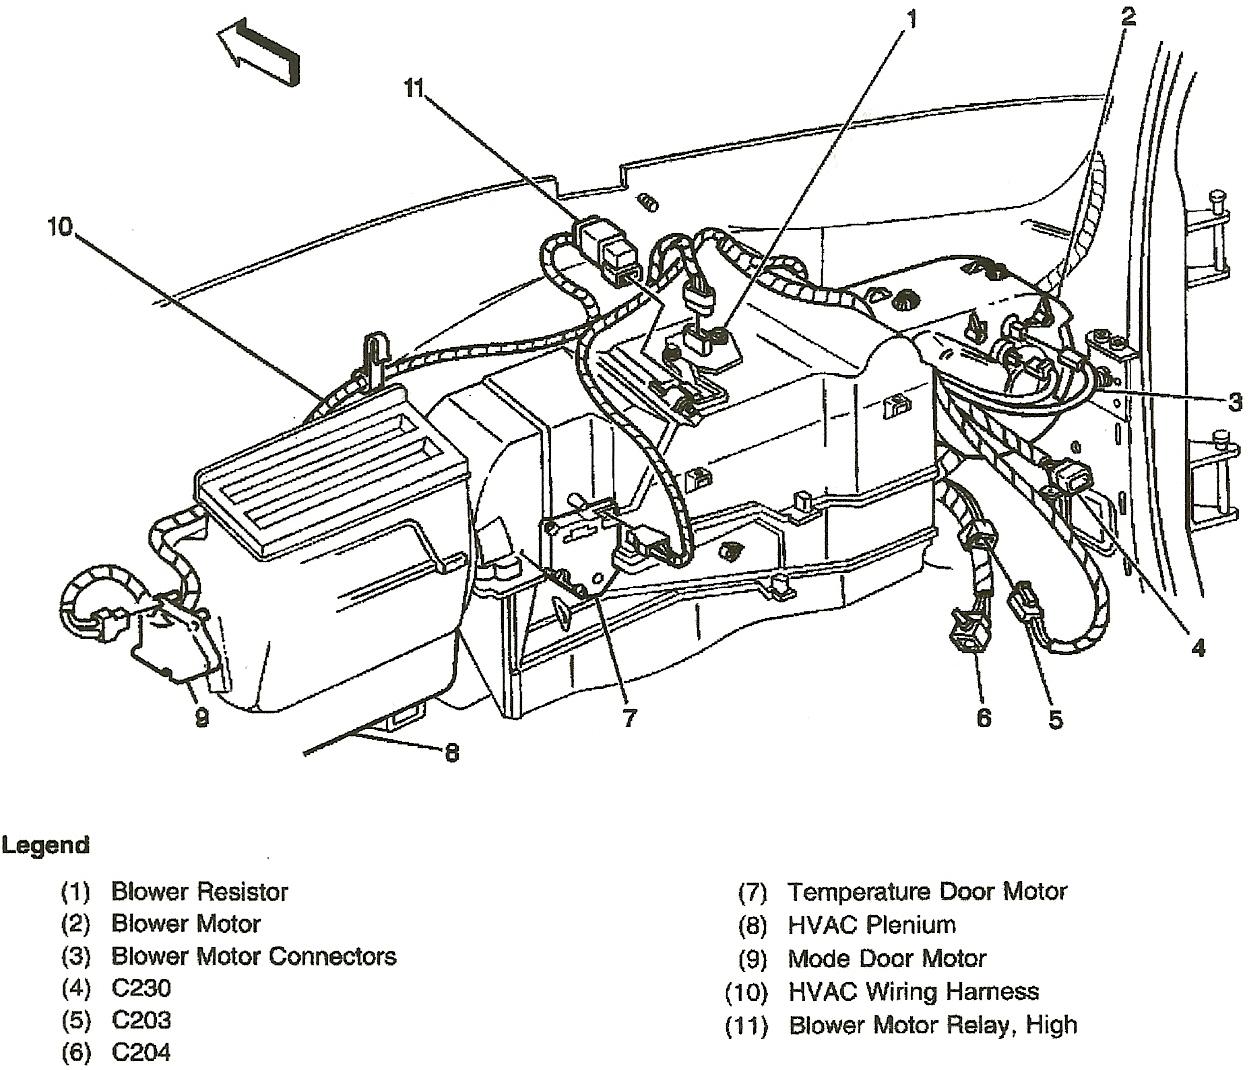 WH_6979] System Wiring Diagram 1999 Gmc 4X4 Schematic WiringAnist Xolia Mohammedshrine Librar Wiring 101